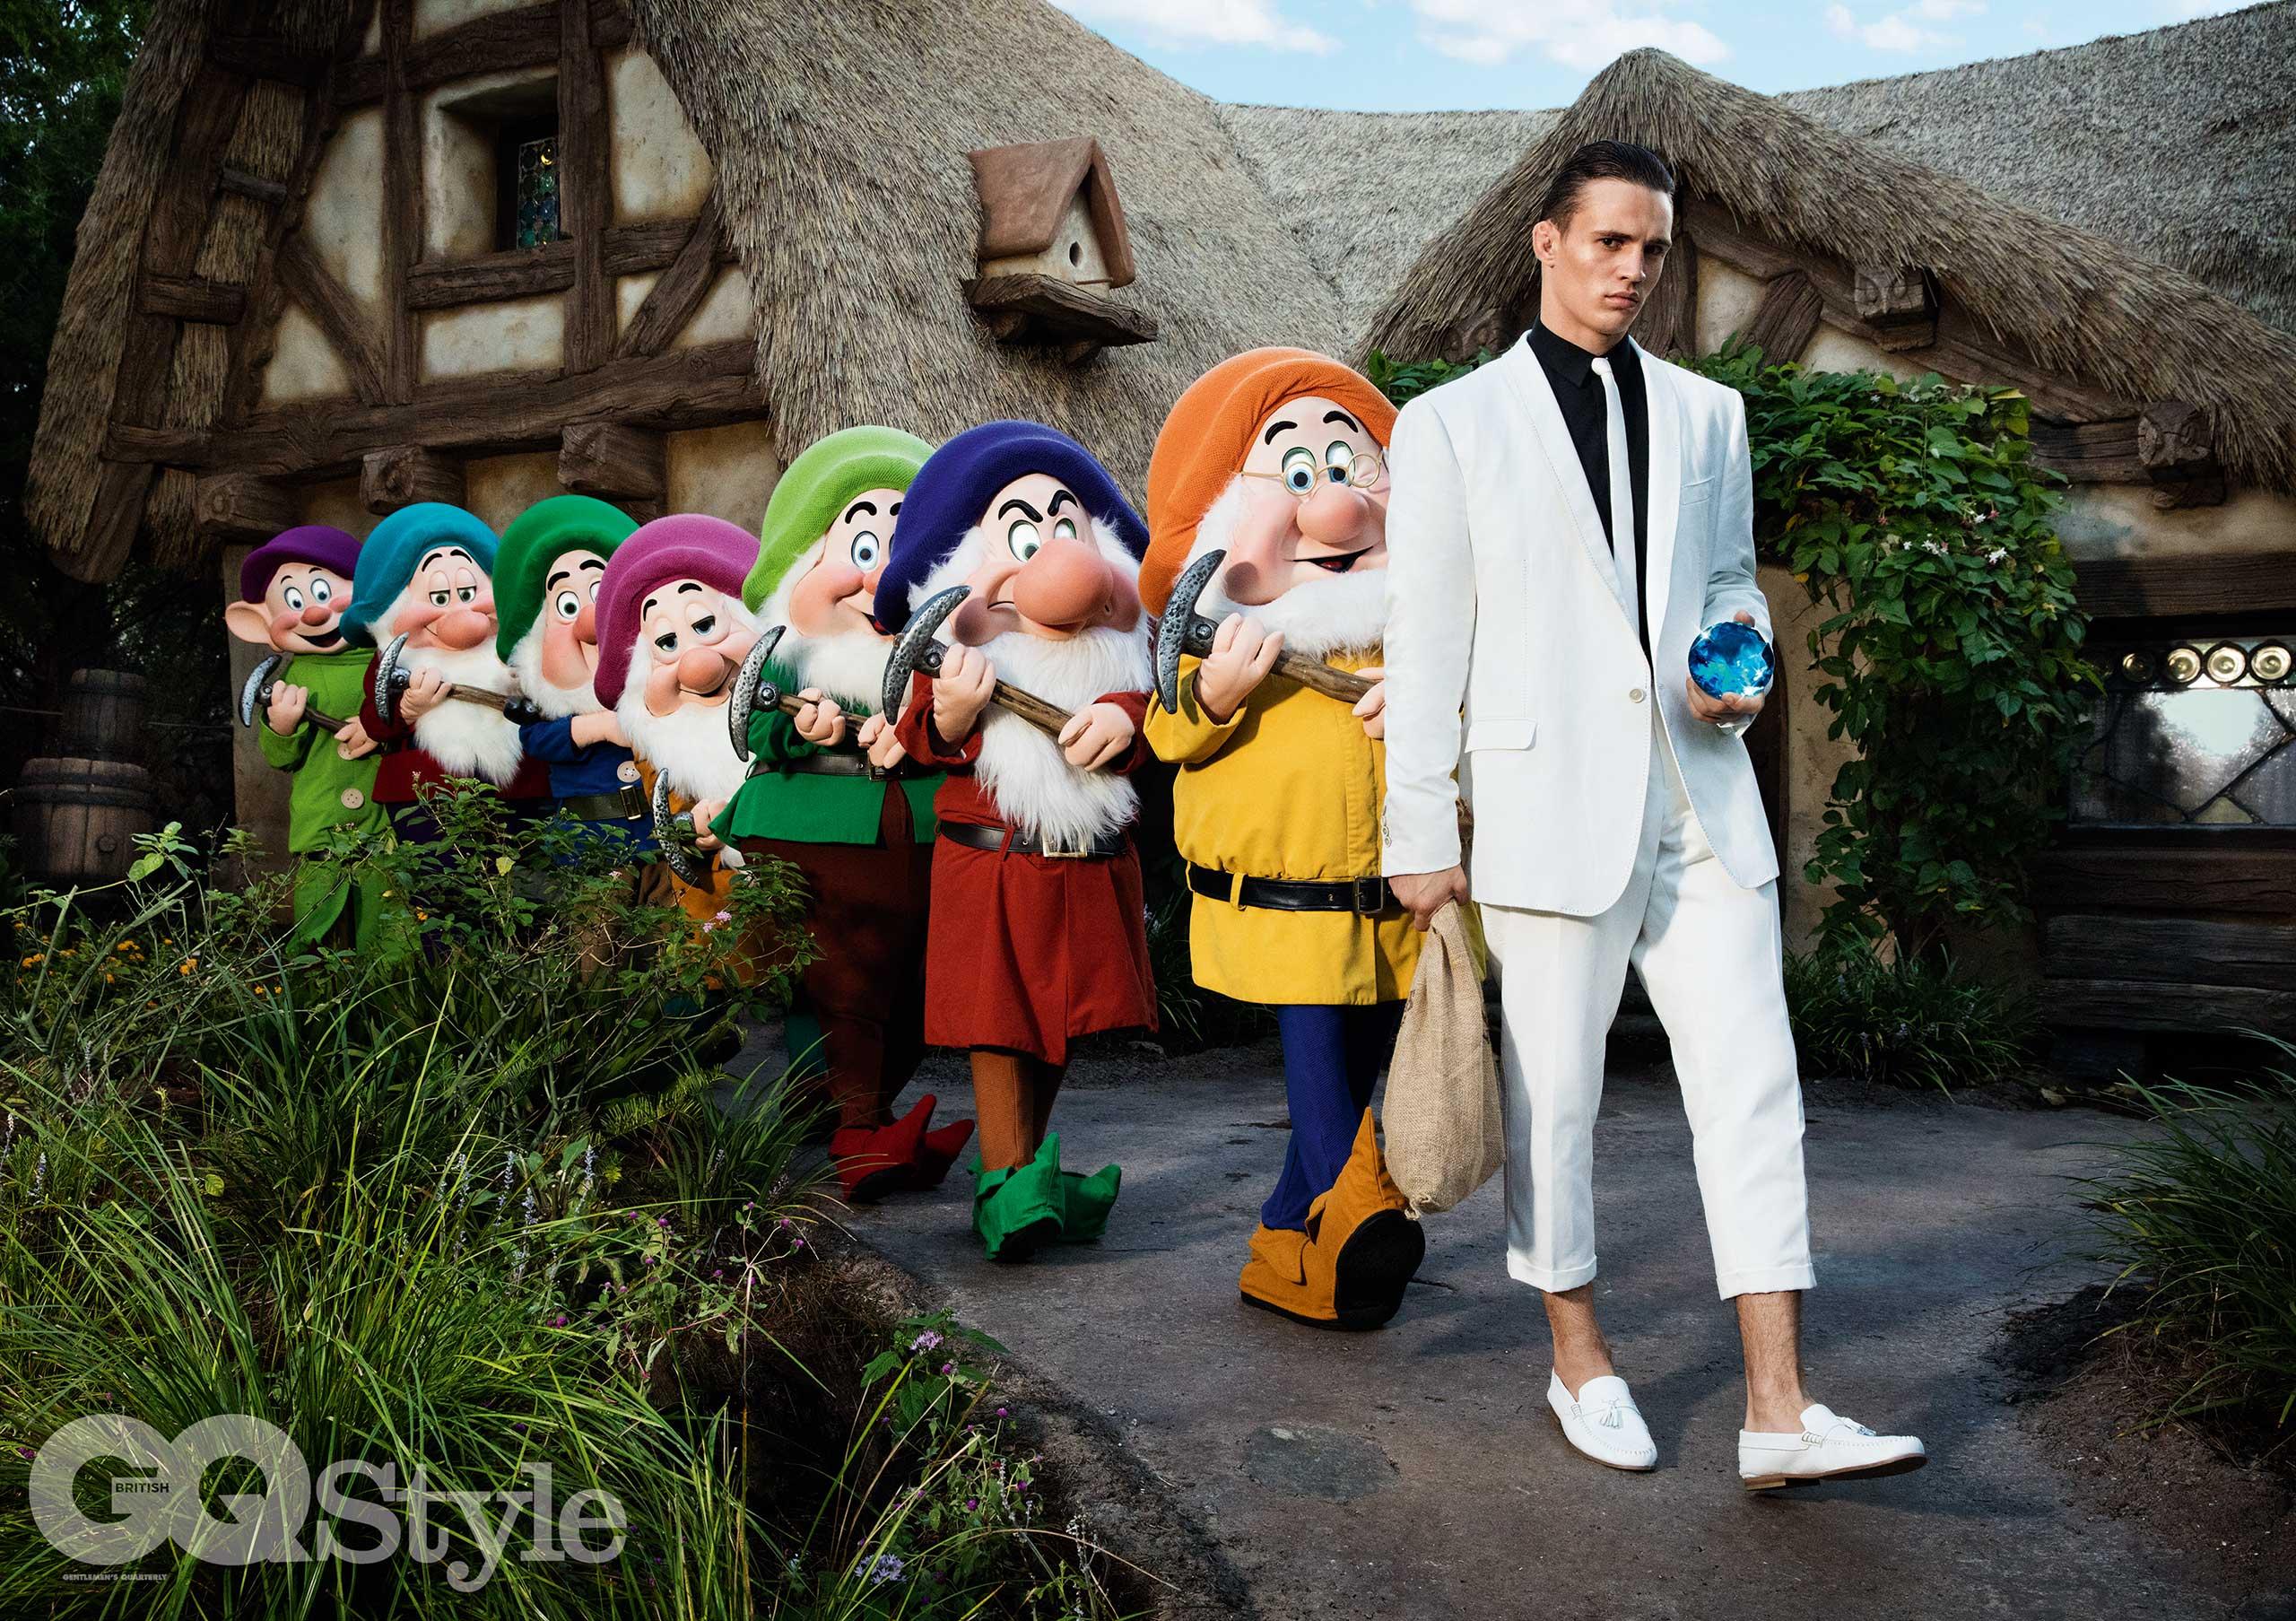 GQ Style magazine menswear fashion shoot at Walt Disney World Resort